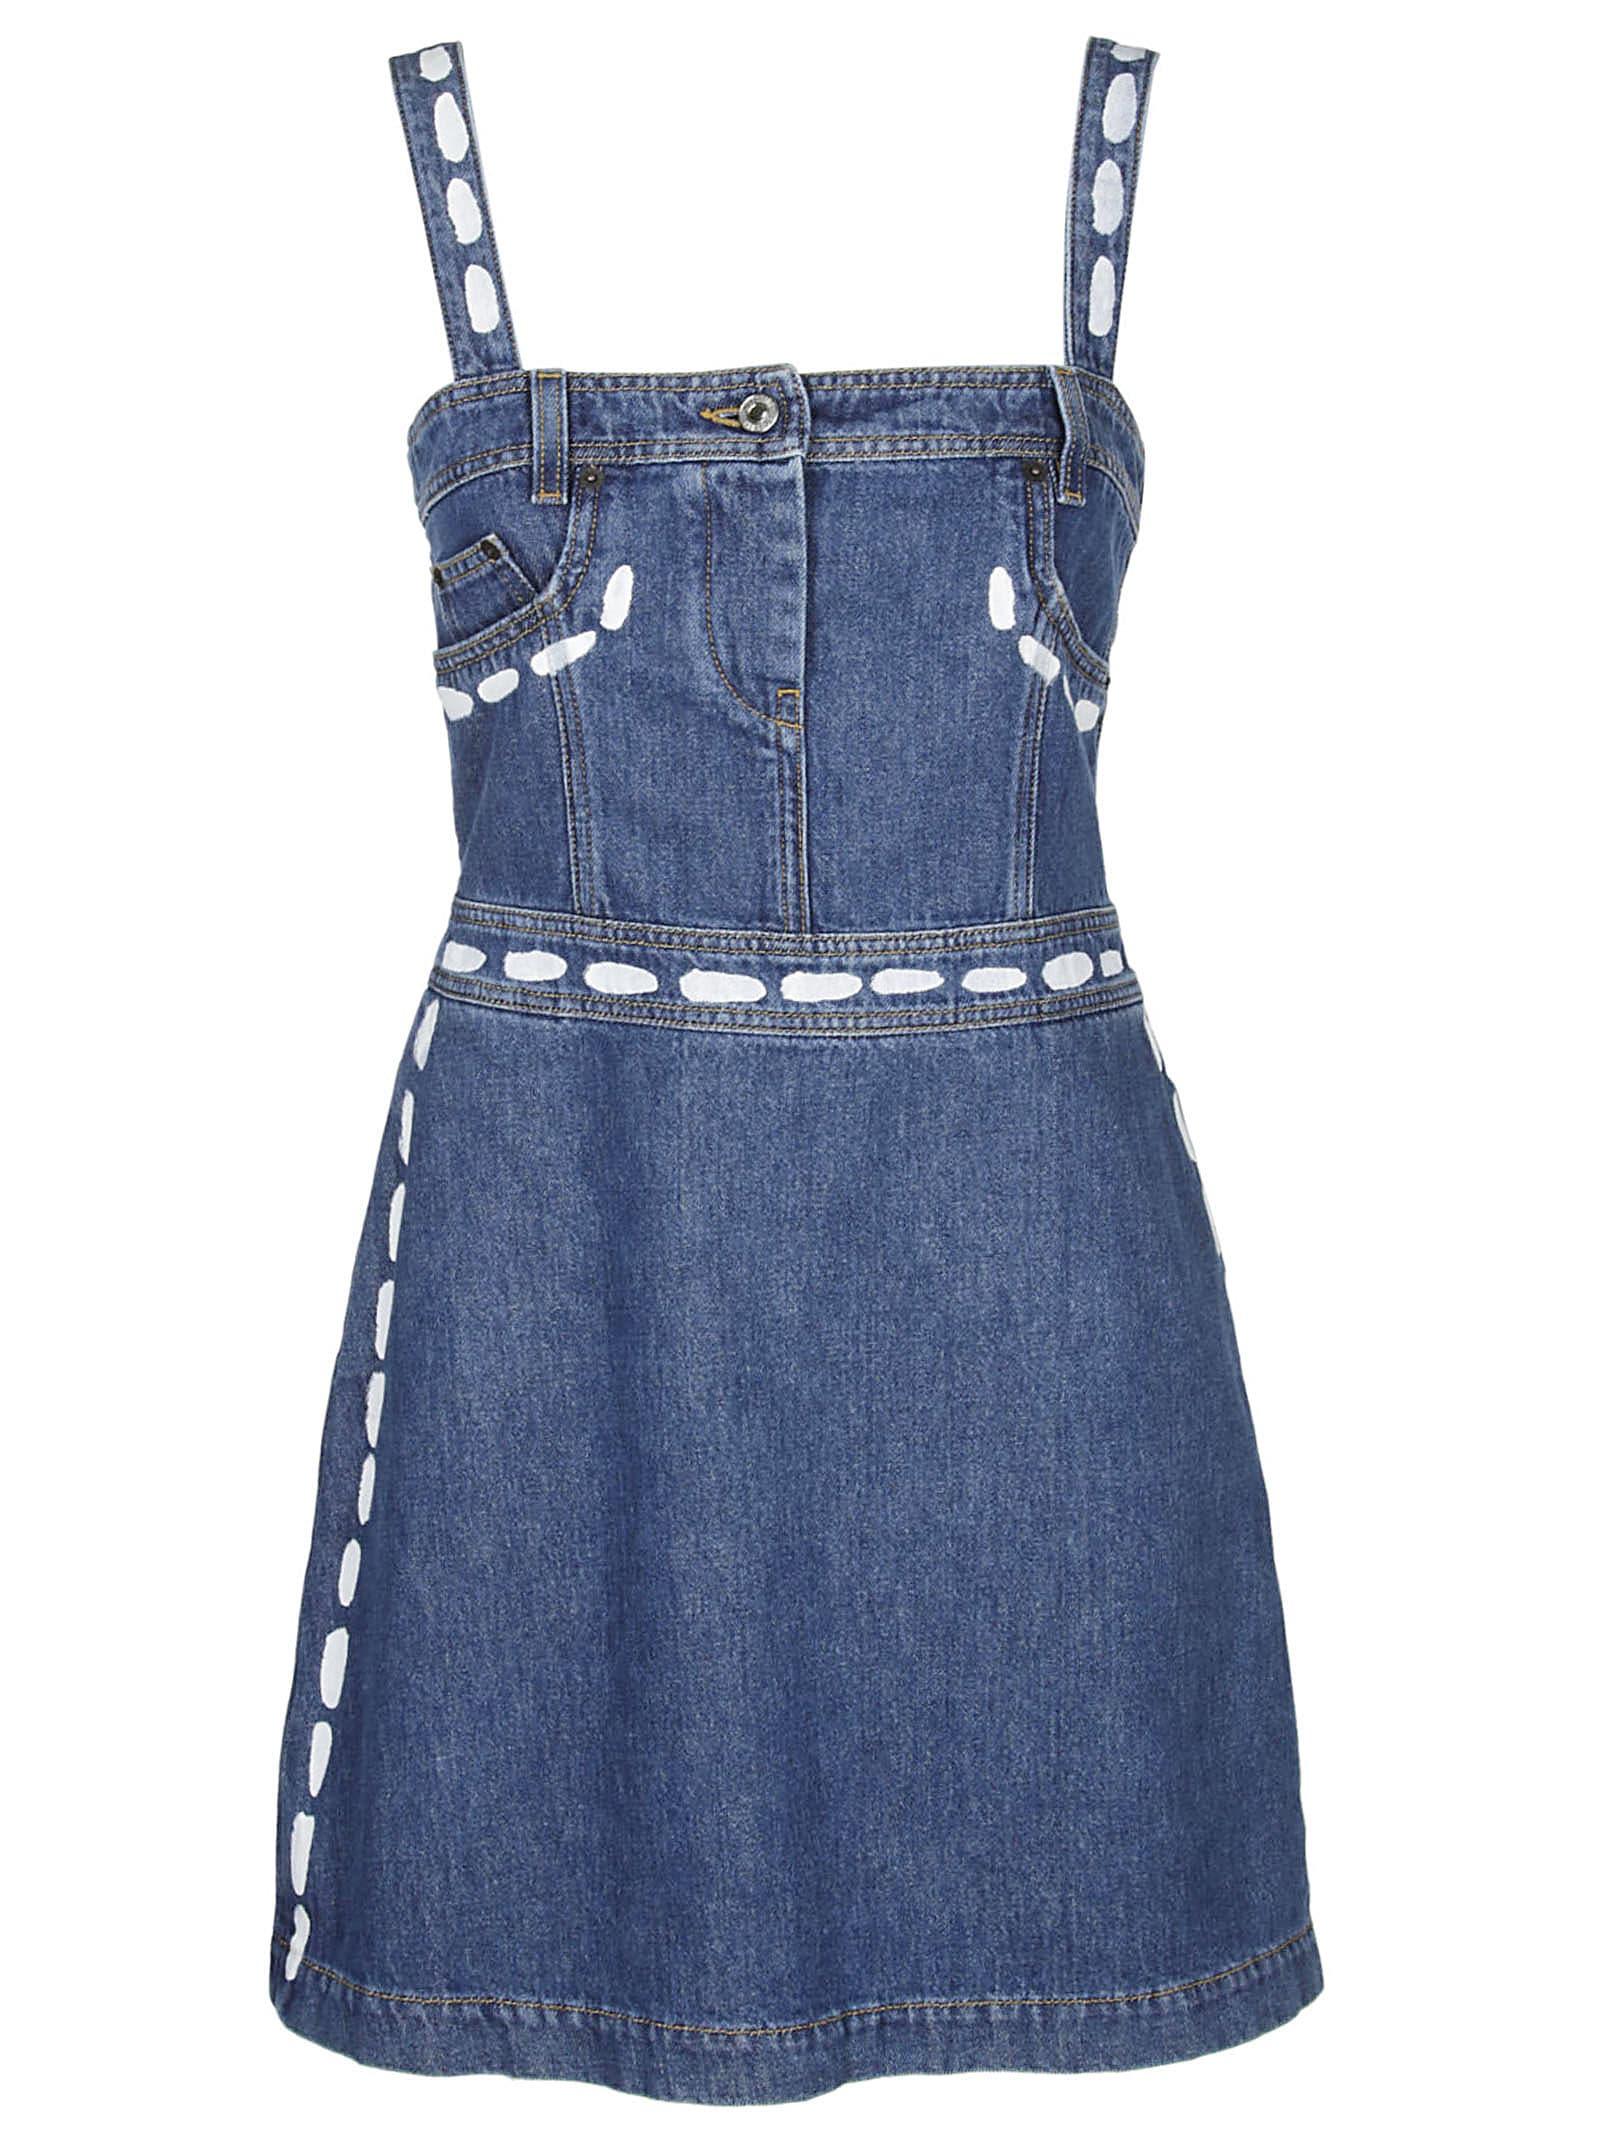 Moschino Pinfore Dress